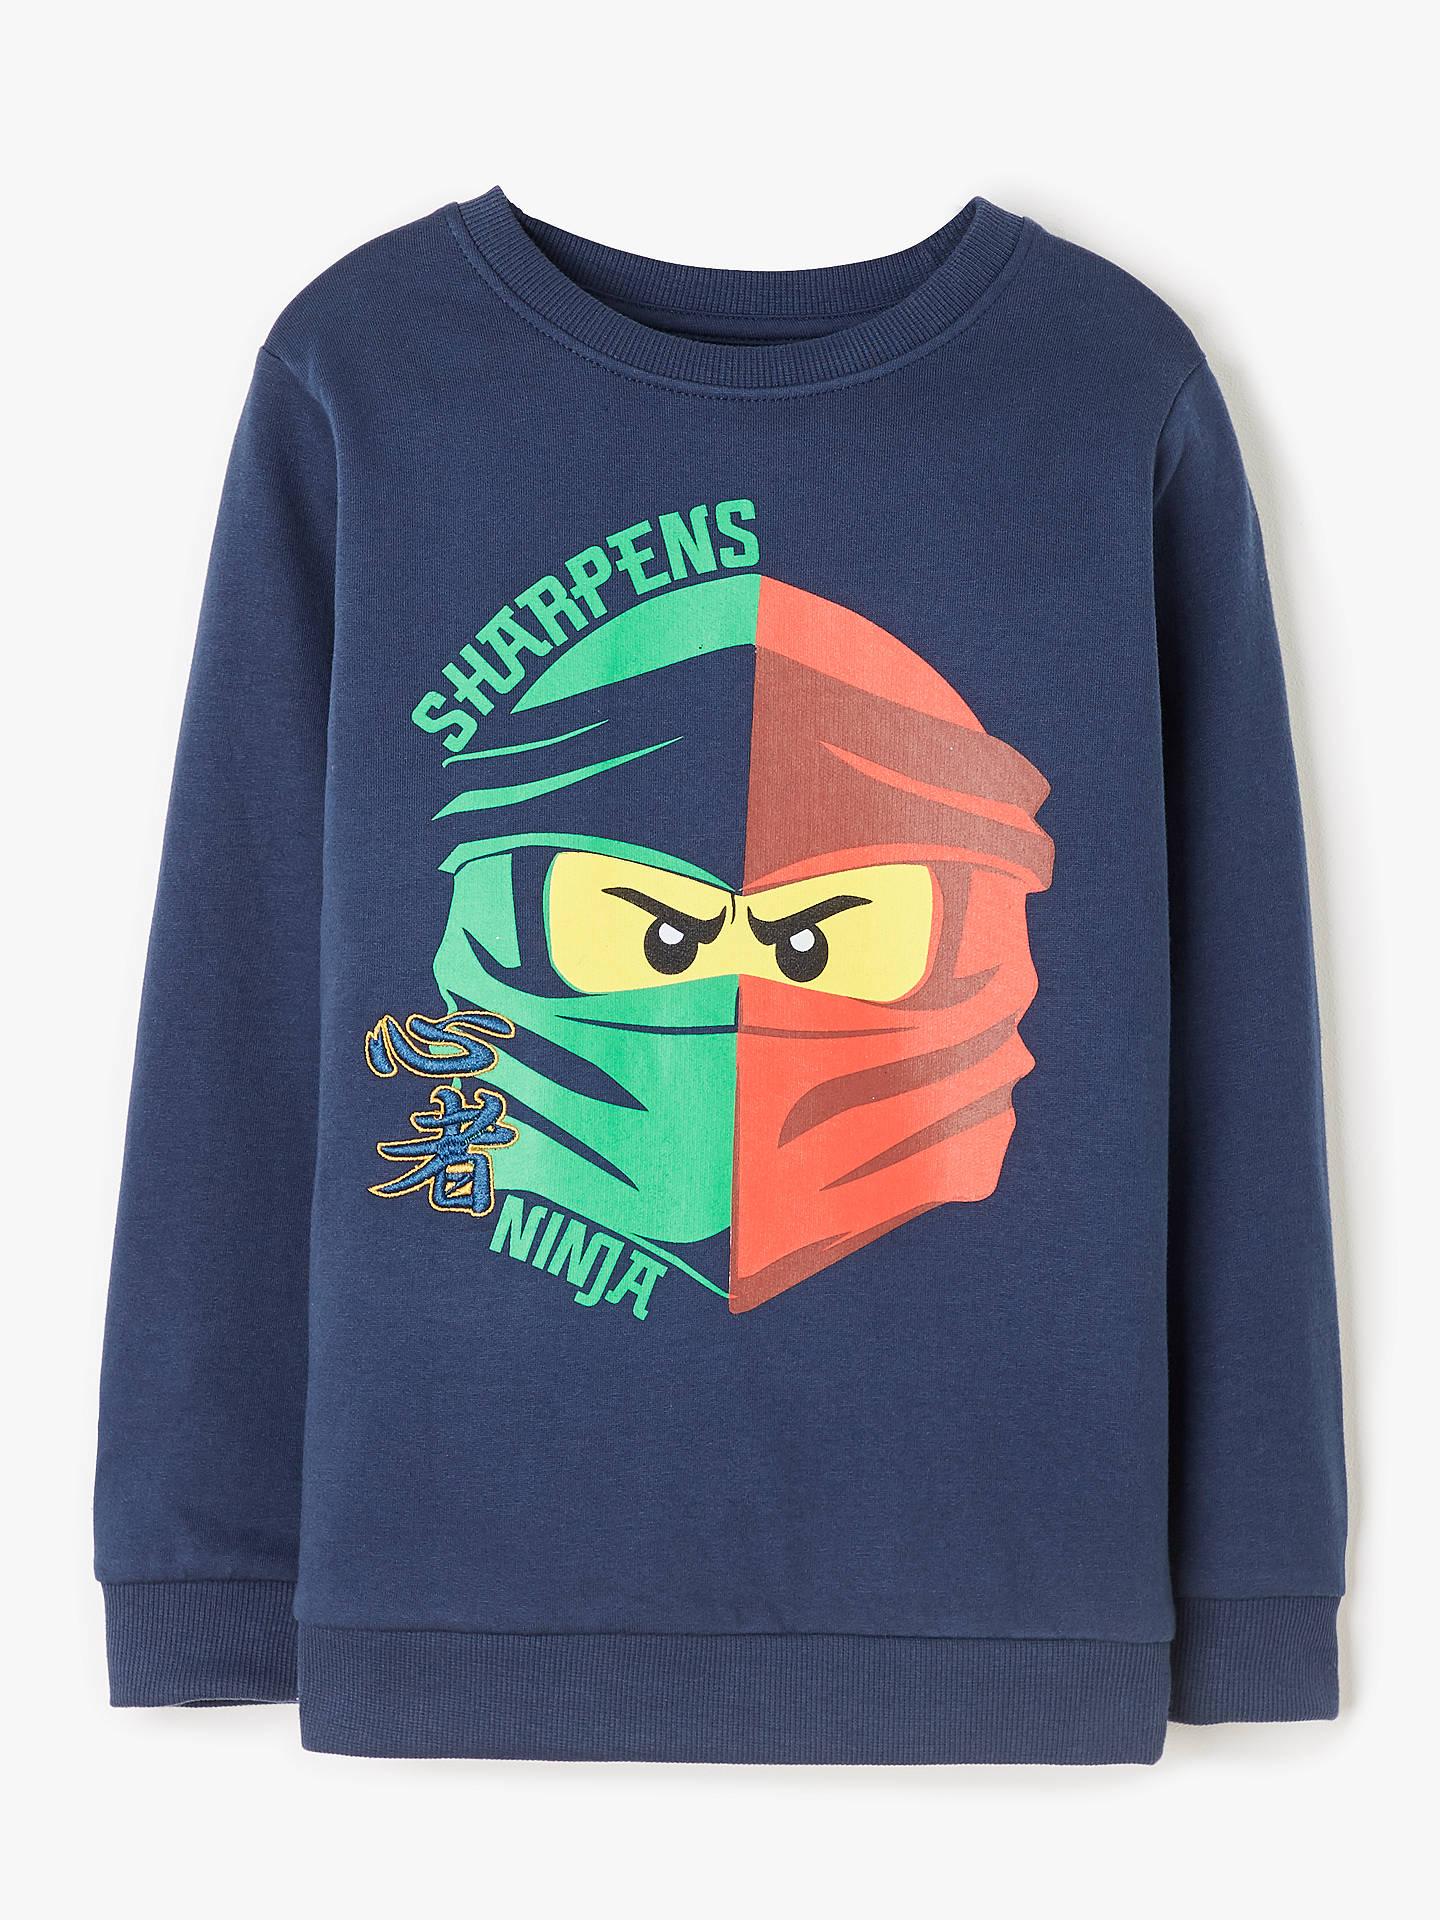 Ninjago Girls Boys Kids Hooded Tops Cartoon T-shirt Hoodie Jumper Age 2-10Years